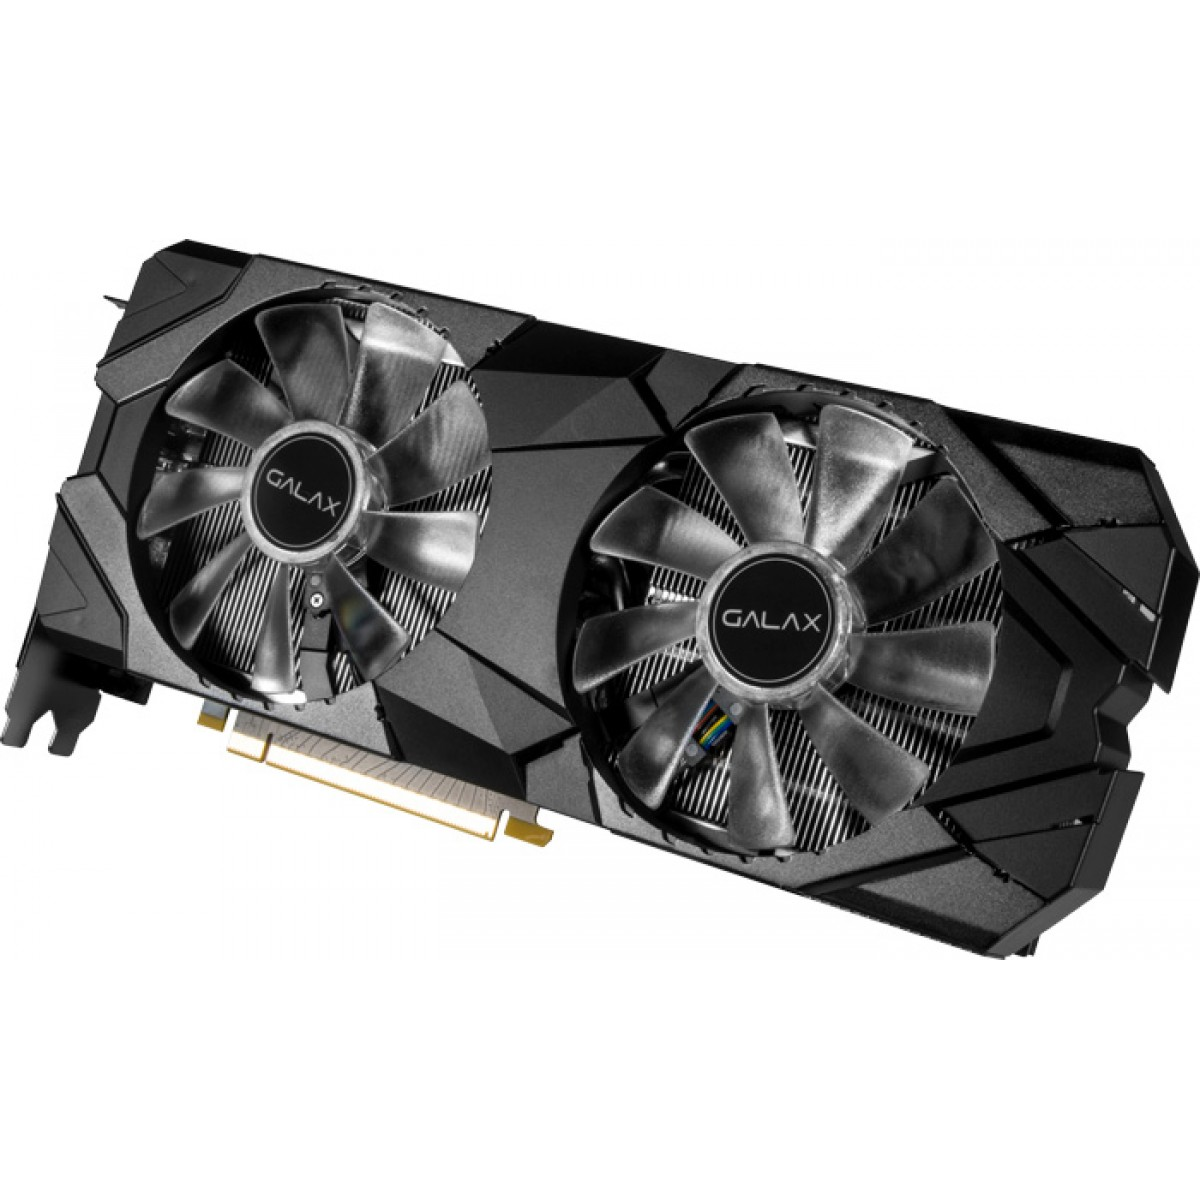 Placa de Vídeo Galax GeForce RTX 2080 Super EX (1-Click OC), 8GB GDDR6, 256Bit, 28ISL6MDU9EX